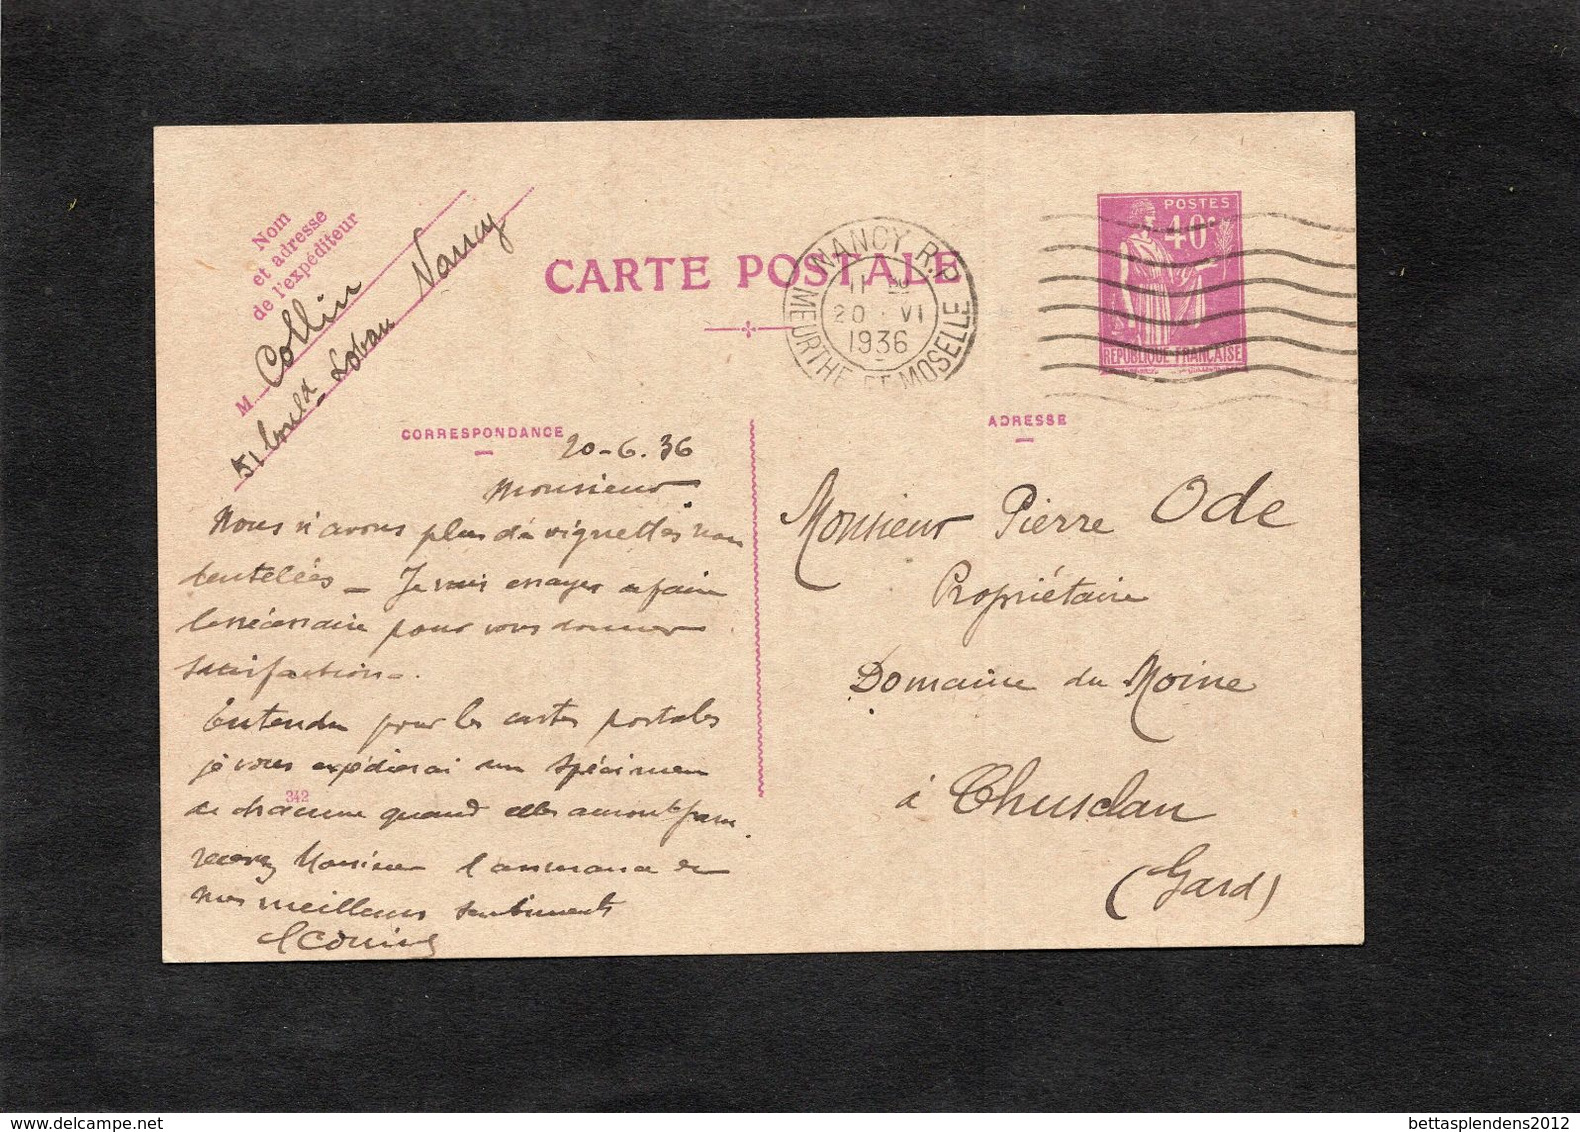 VITTEL 12-15 Aout 1934 - EXPOSITION PHILATELIQUE - Entier Postal Ayant Circulé - Cachet Hexagonal CHUSCLAN (Gard) - Overprinter Postcards (before 1995)